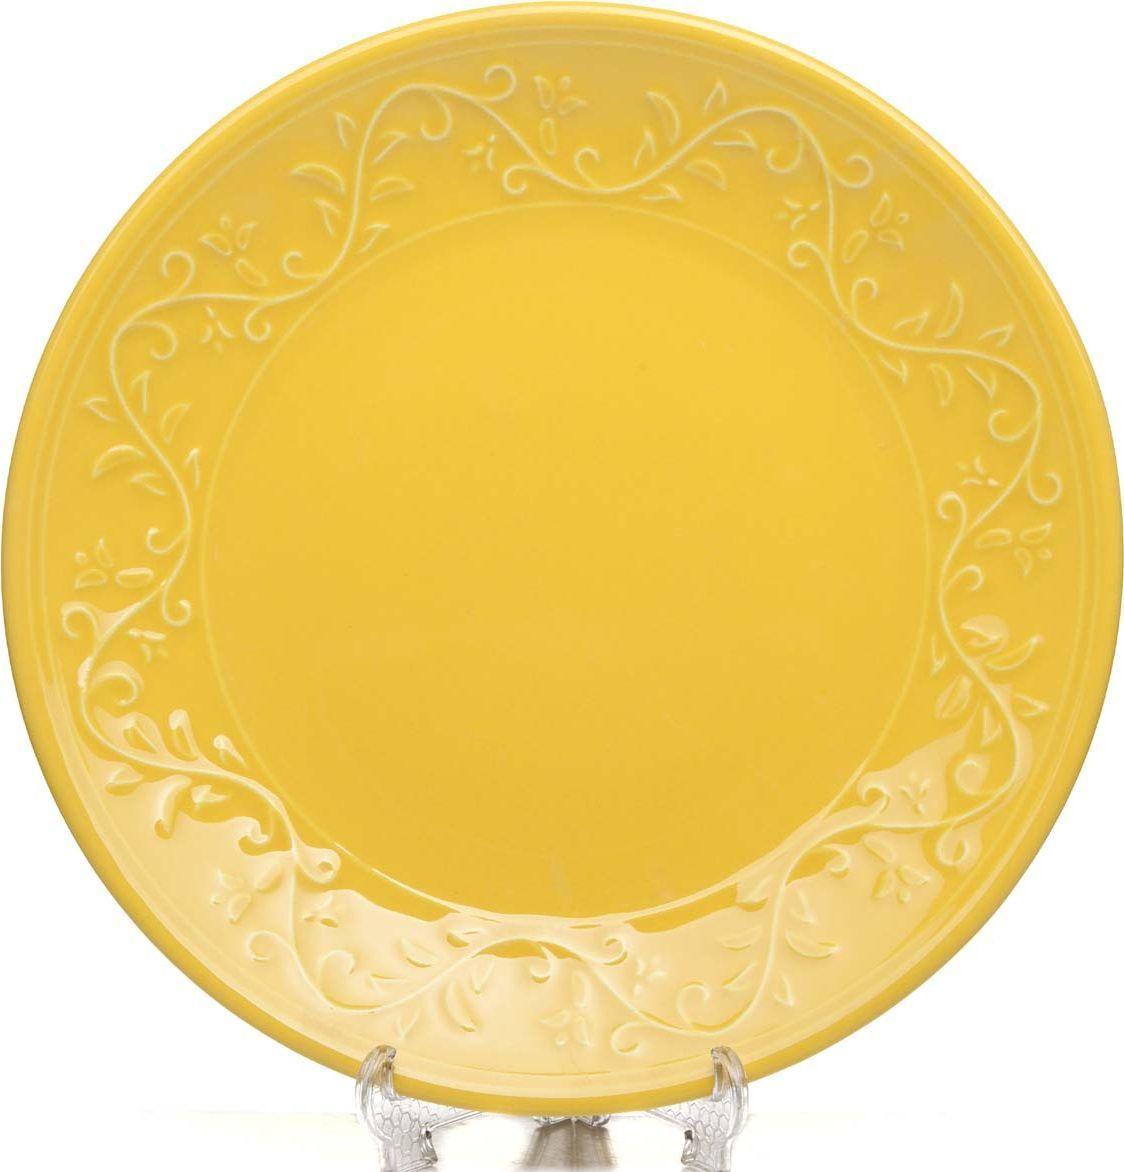 Тарелка Kutahya Porselen IVY, желтый, диаметр 26 см